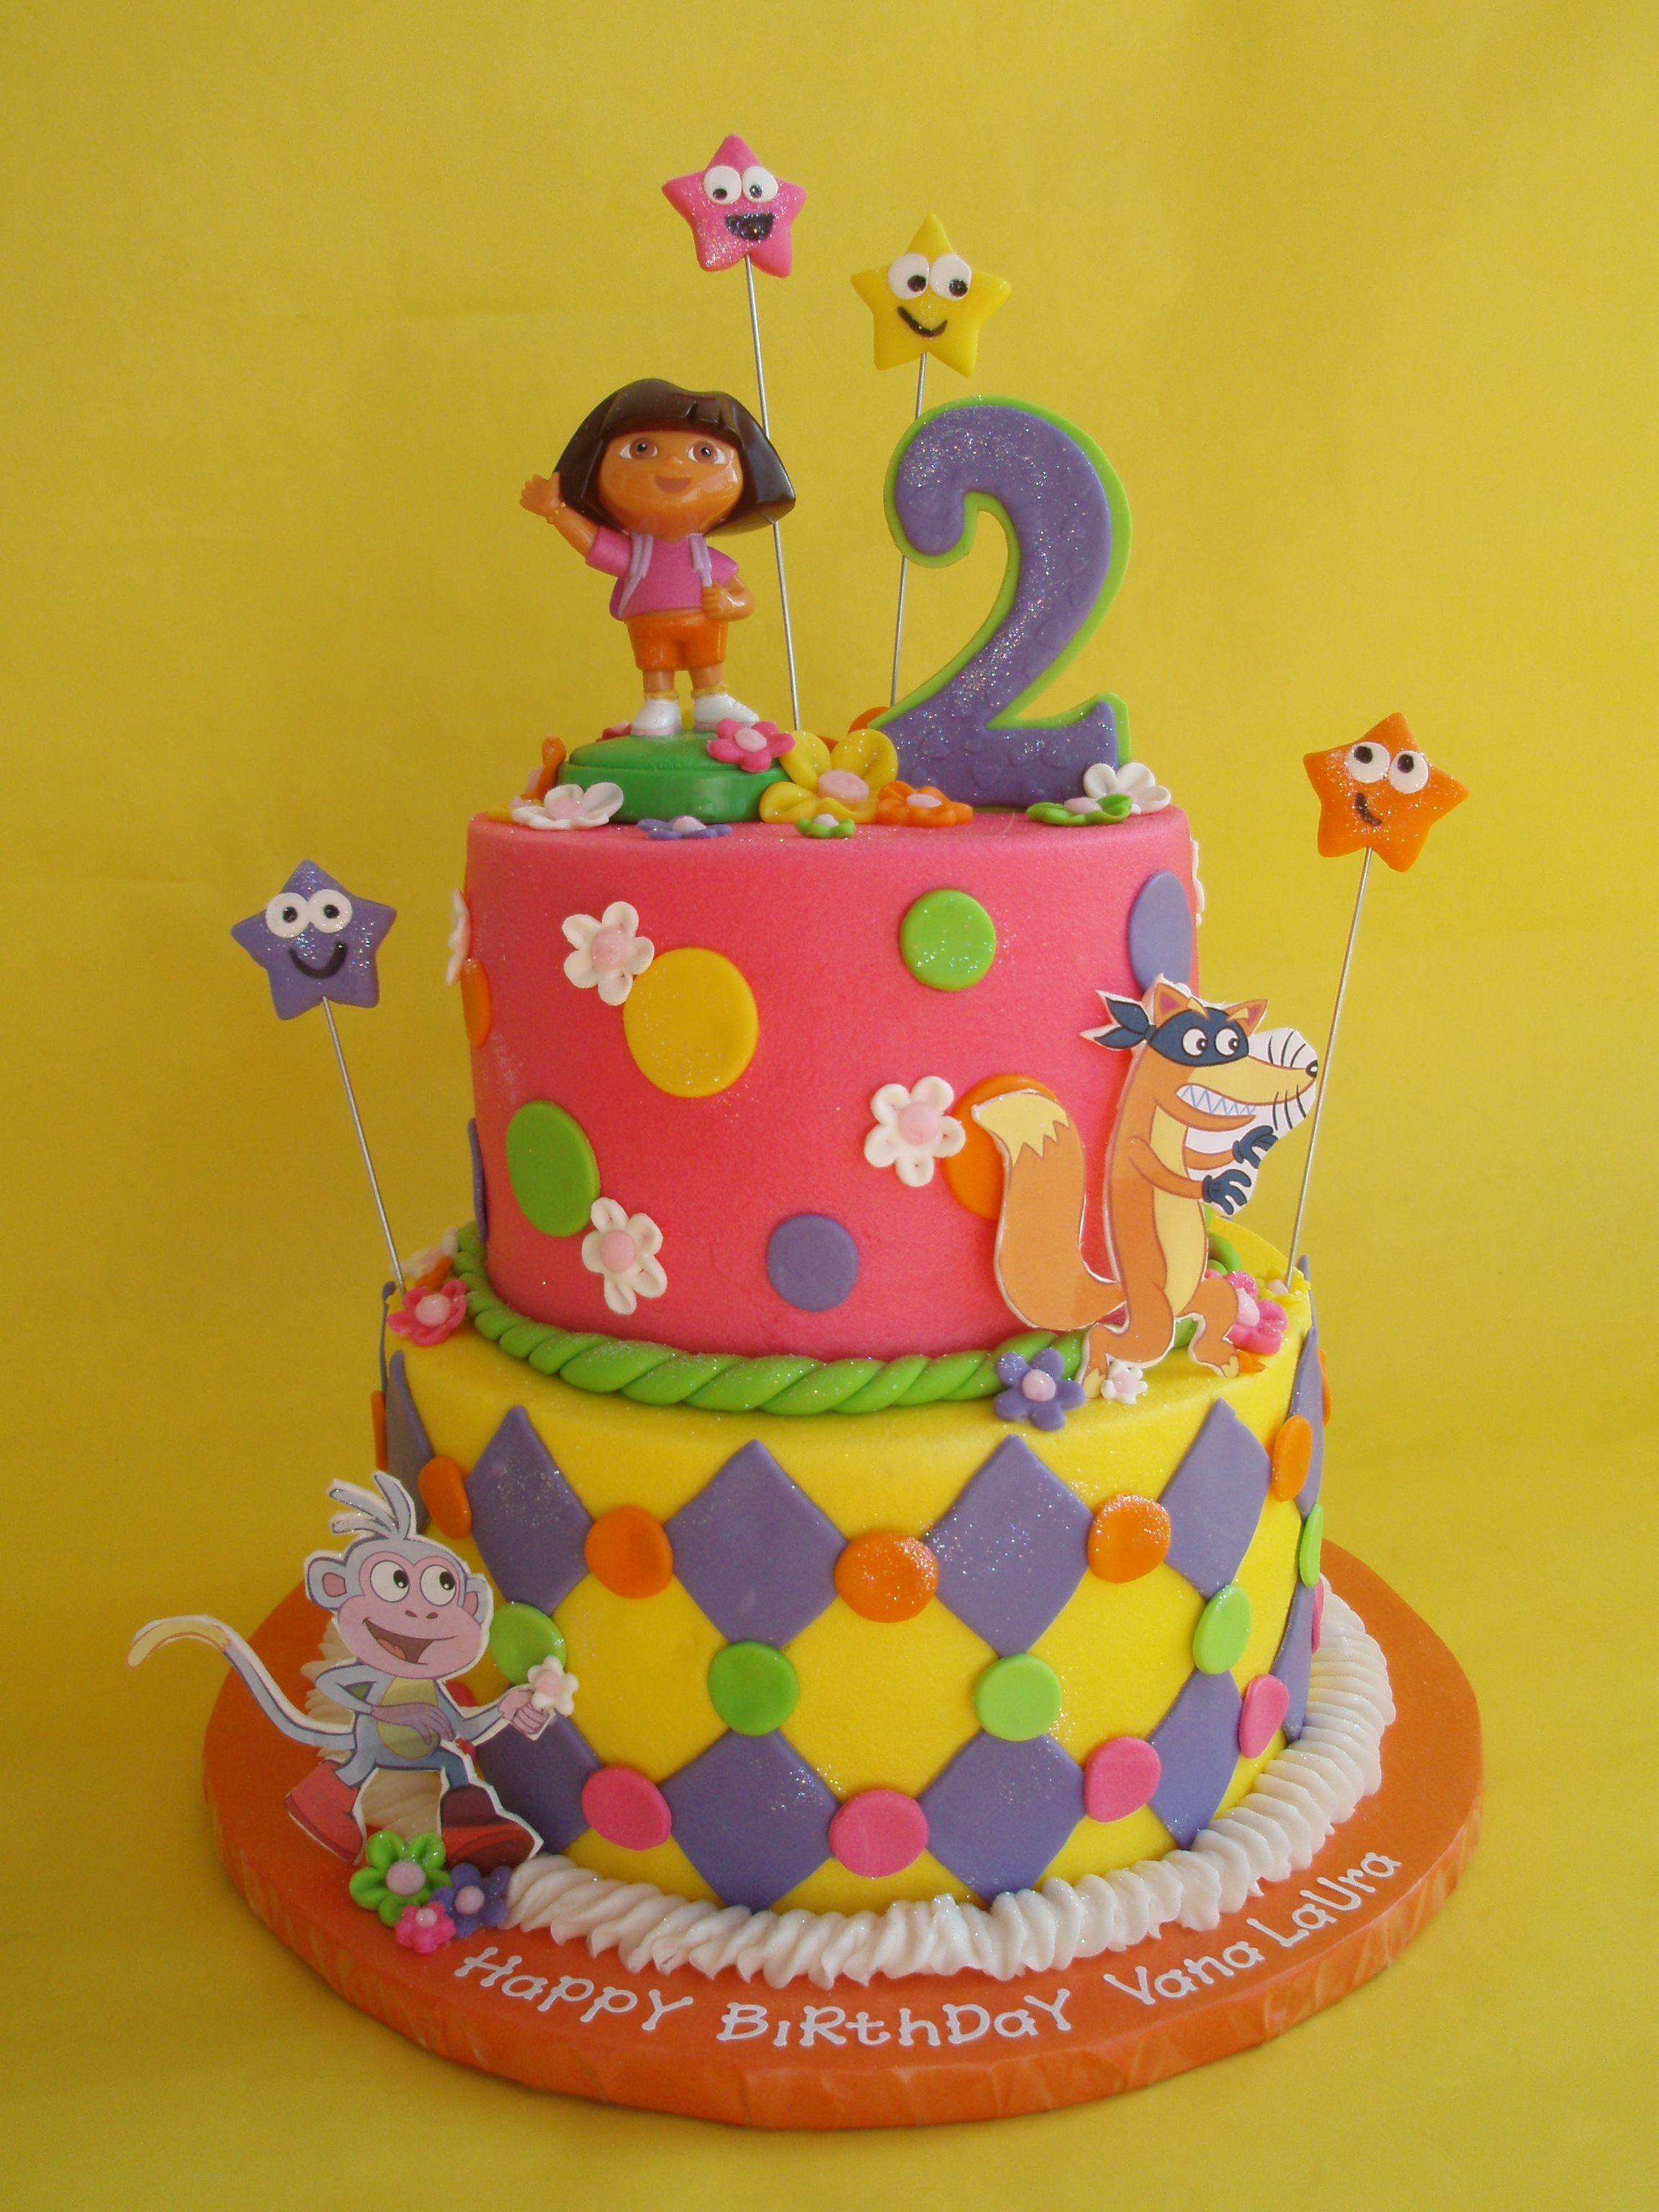 Dora Cake Toppers Walmart